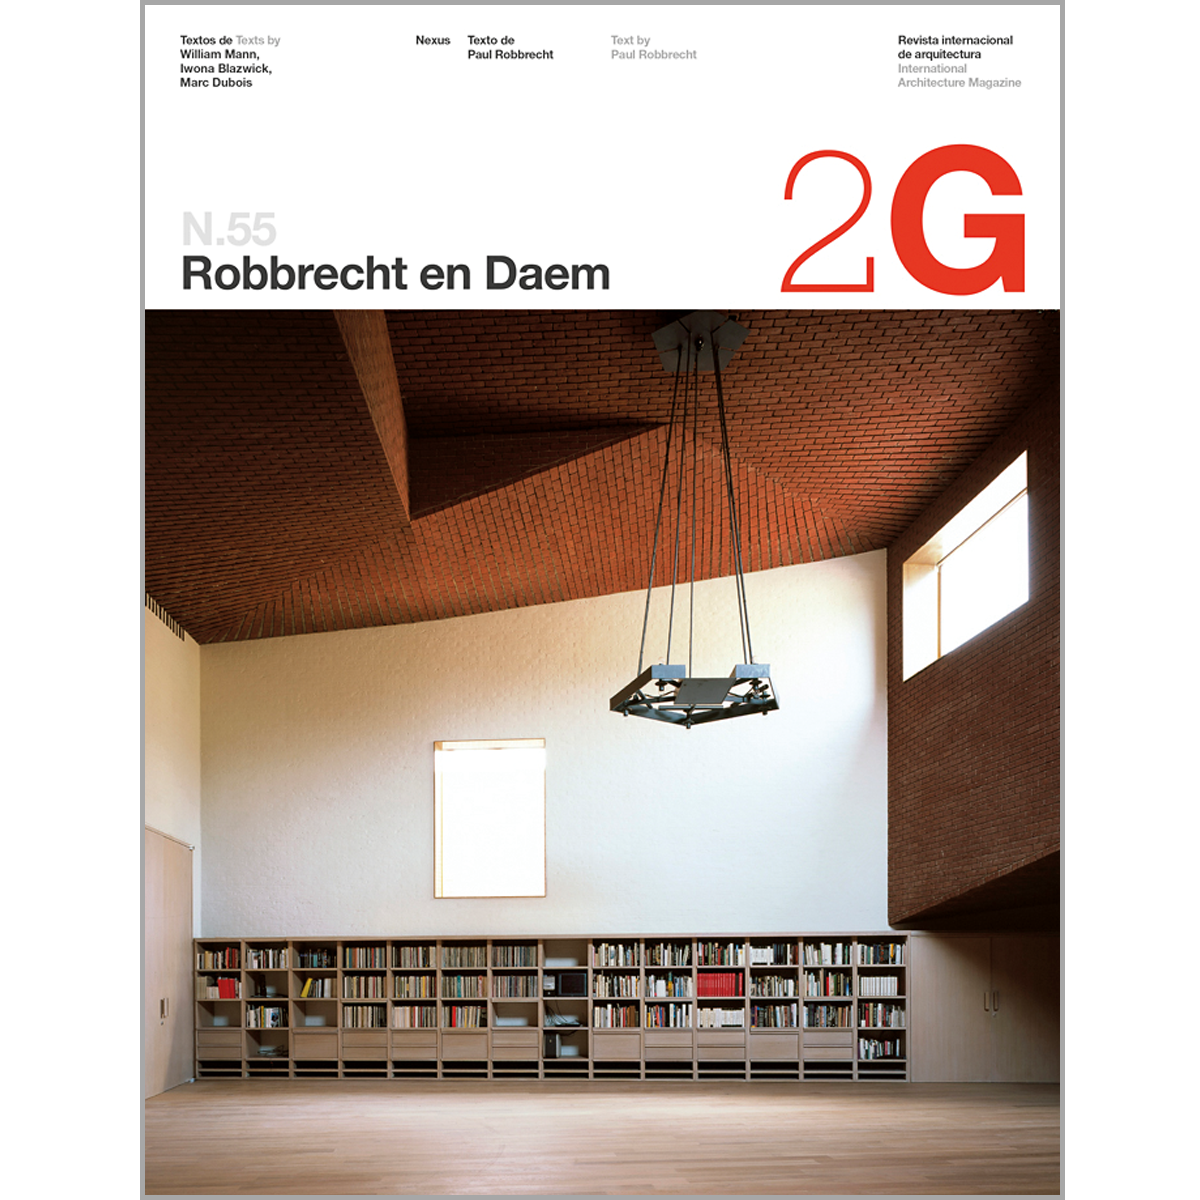 2G: Robbrecht en Daem